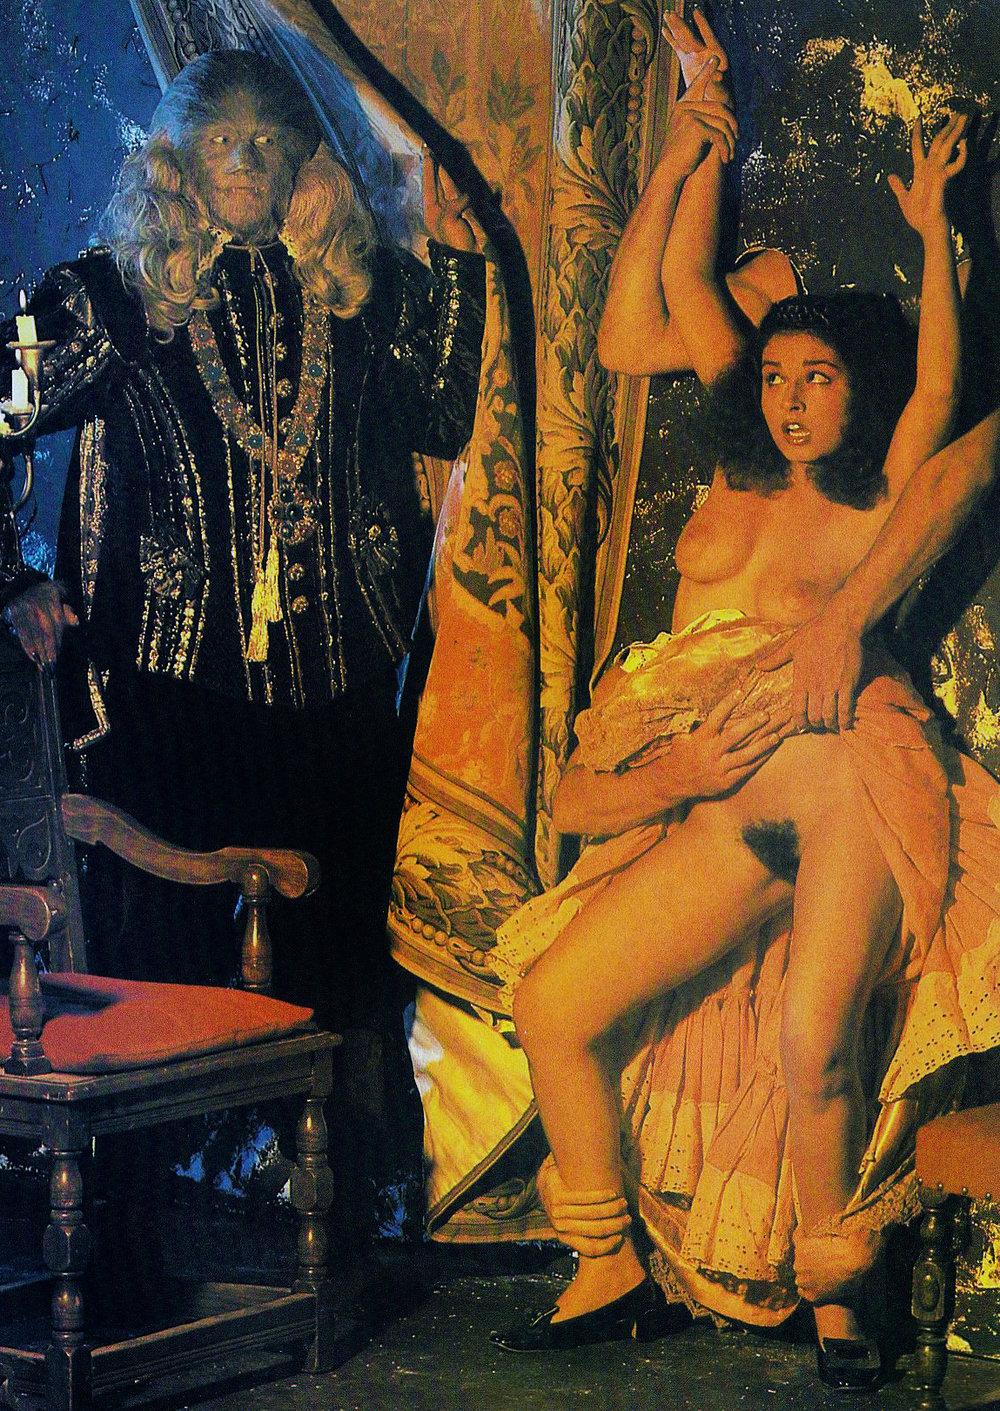 Yolanda Lancaster Hustler Magazine 1981 03.jpg